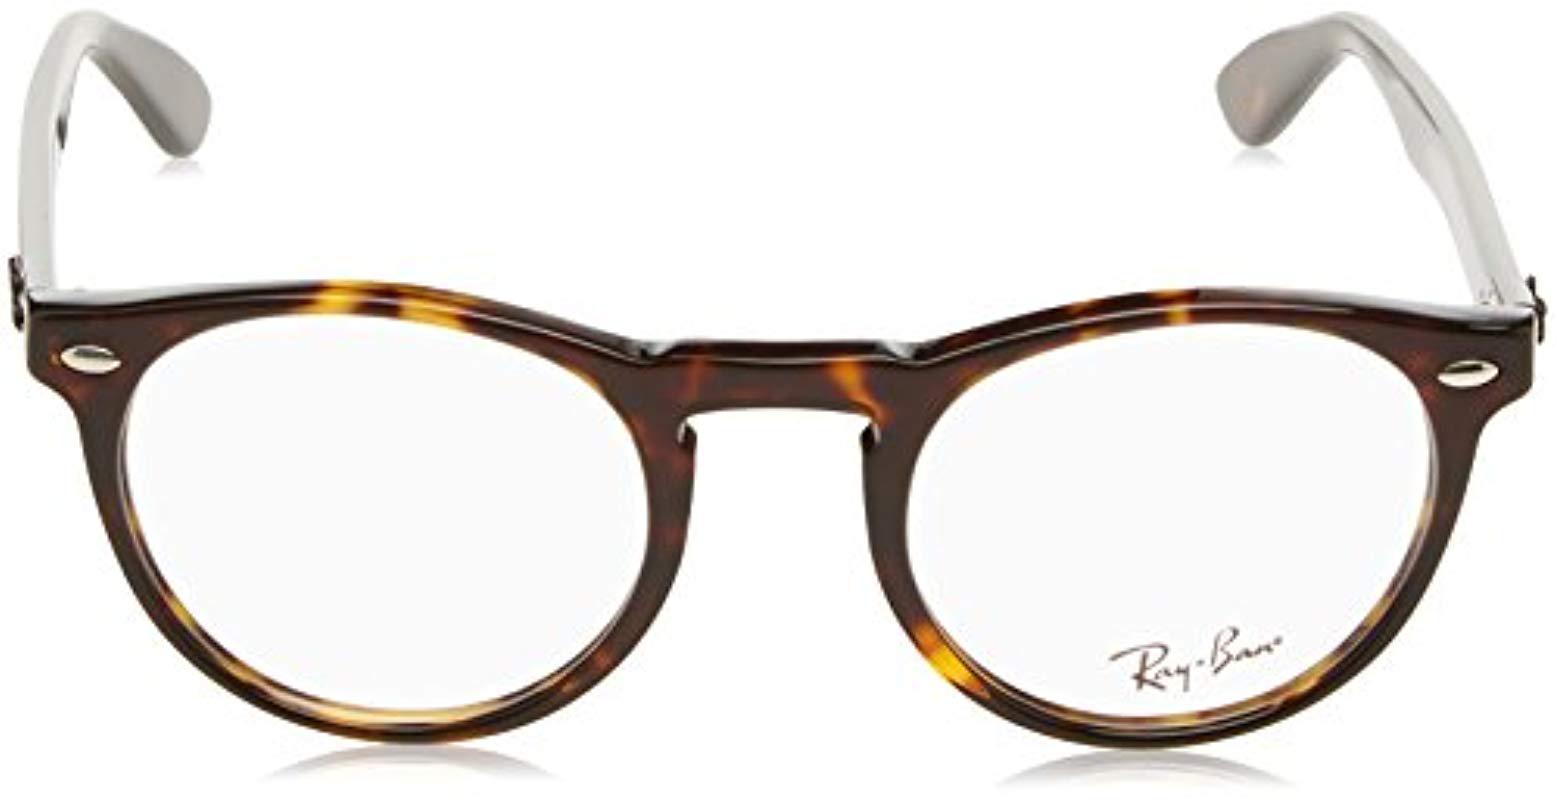 573664480c9 Ray-Ban - Brown Rx5283 Glasses In Dark Havana Rx5283 2012 49 - Lyst. View  fullscreen